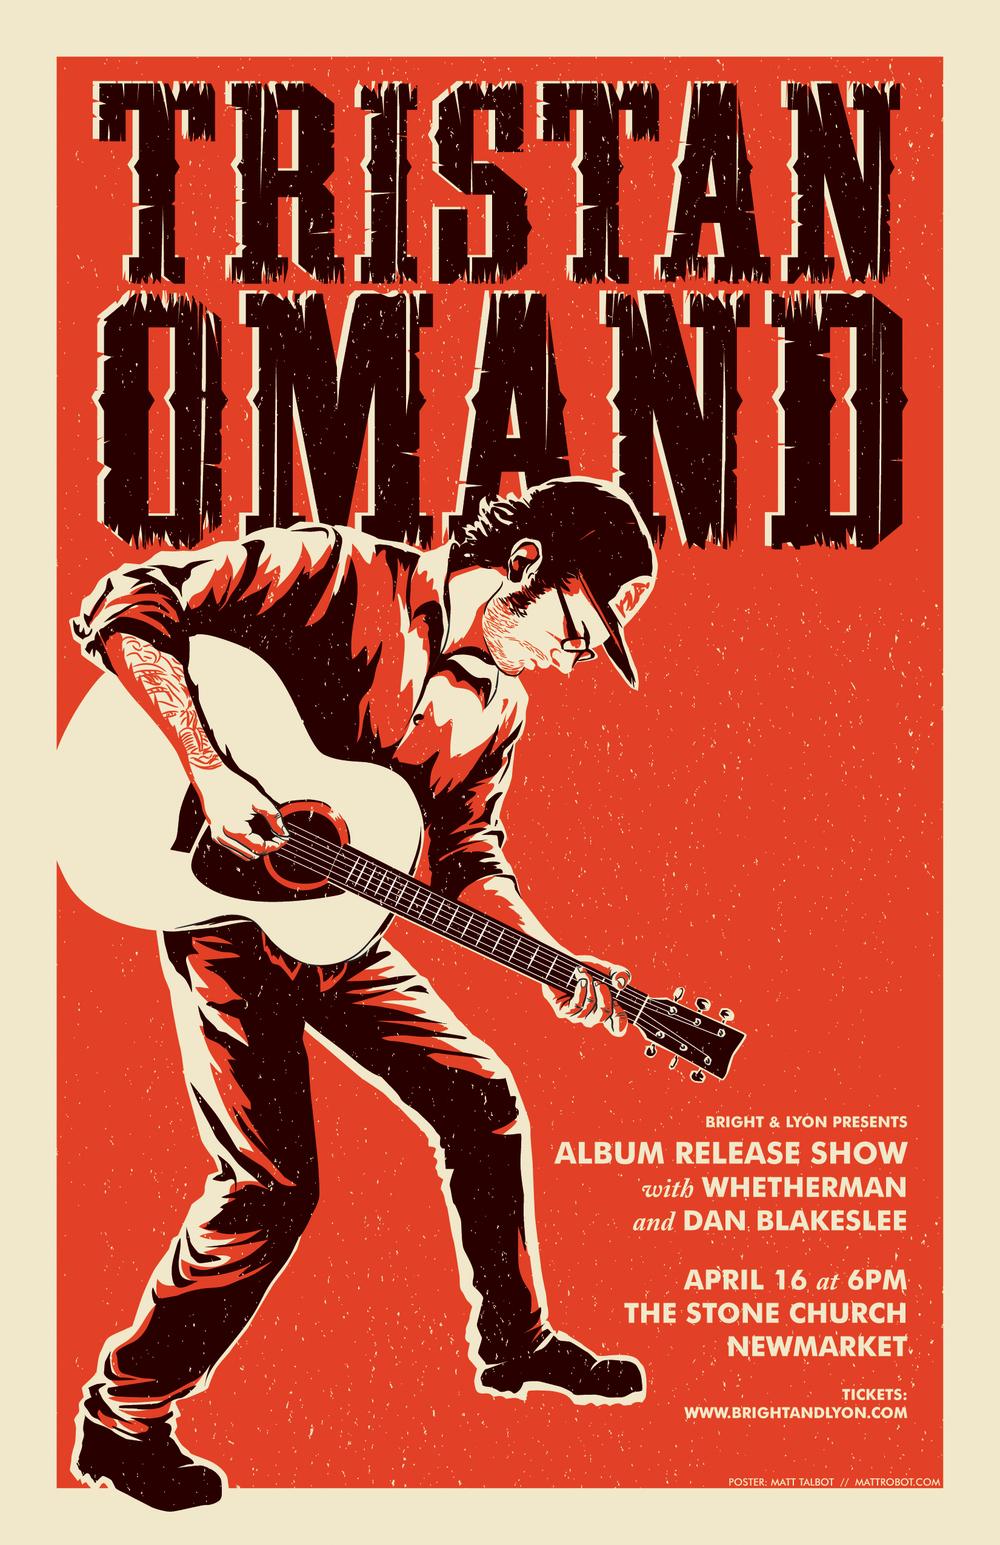 Tristan Omand gig poster by Matt Talbot